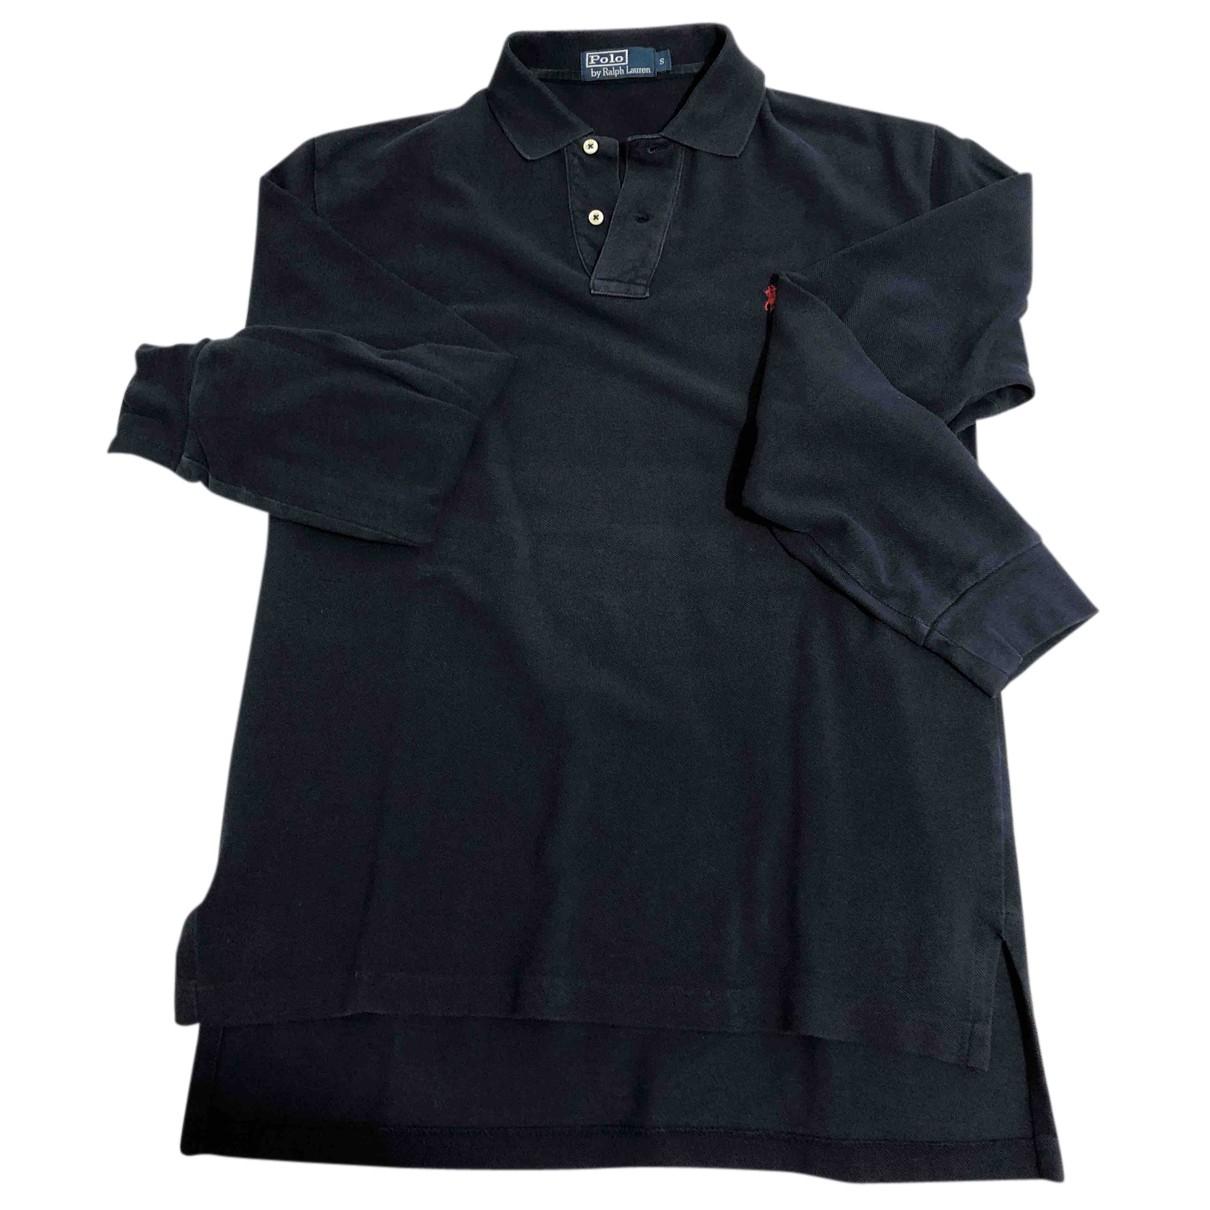 Polo Ralph Lauren - Polos Polo ajuste manches longues pour homme en coton - bleu